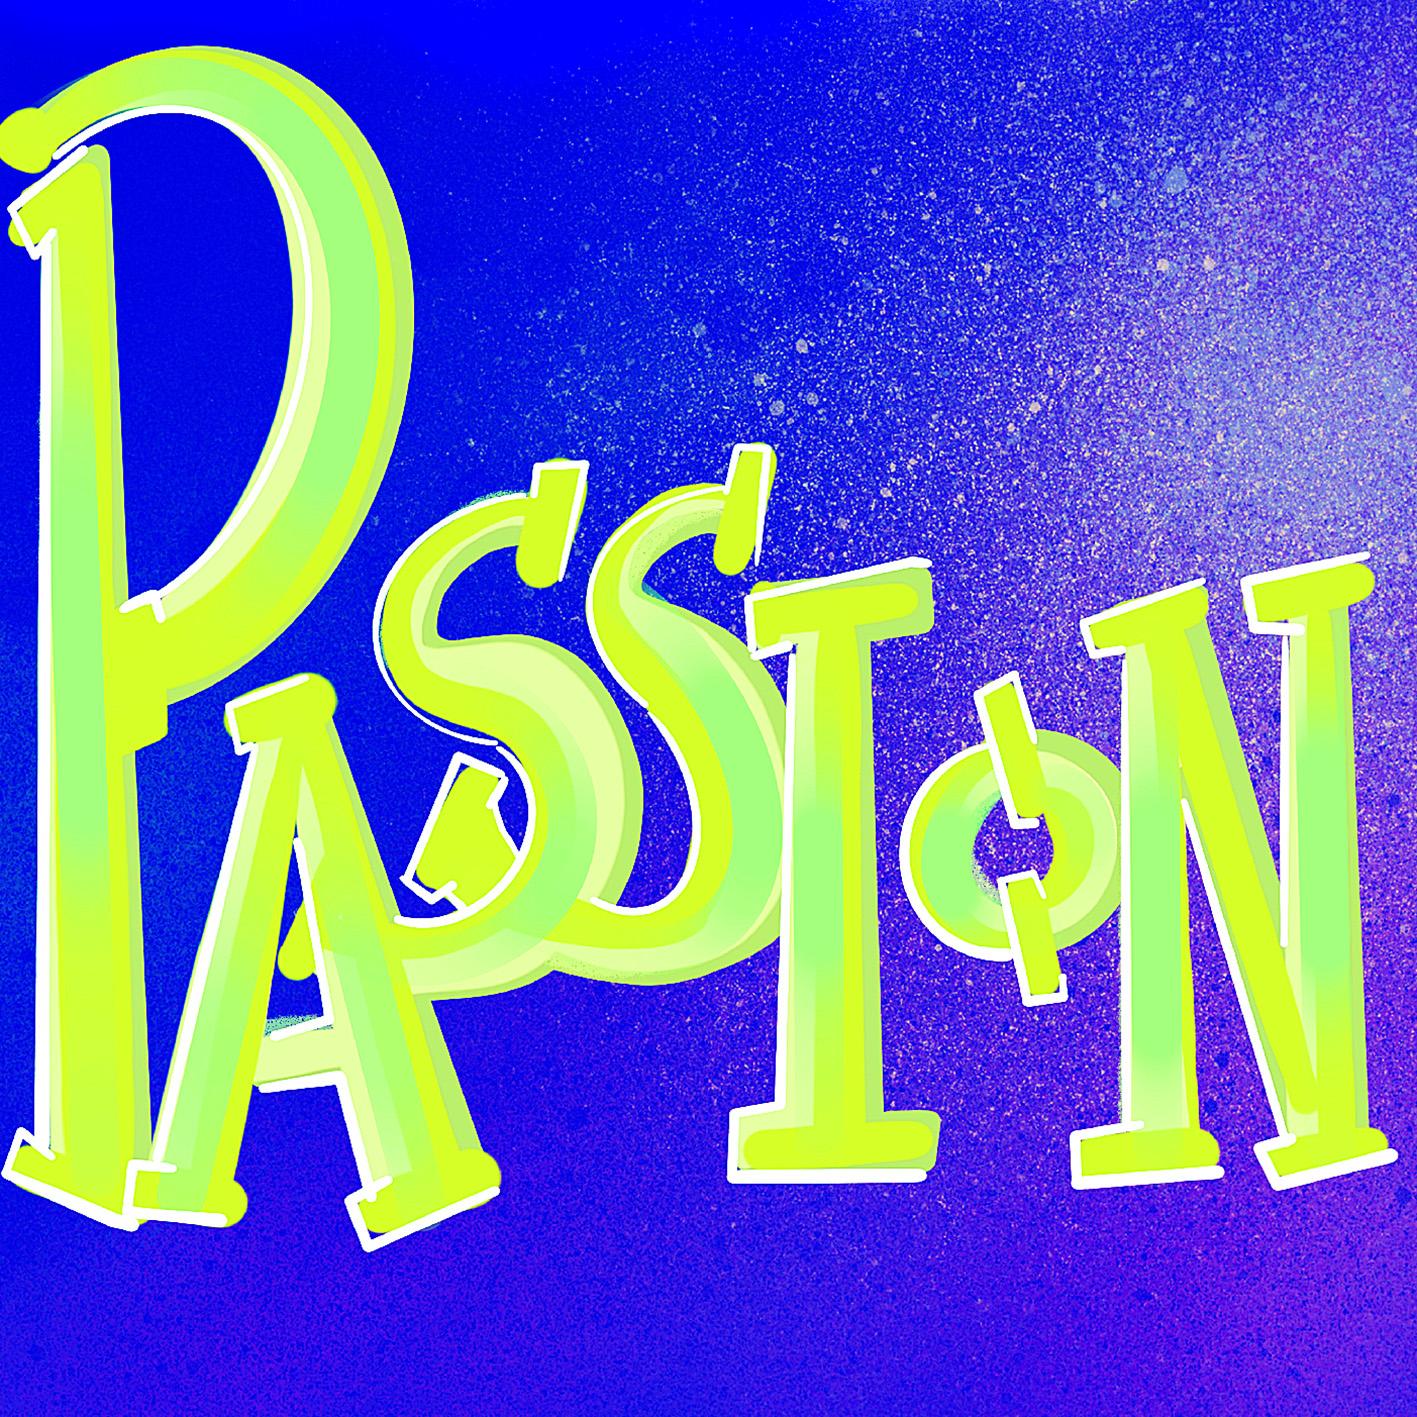 Passion-Artwork.jpg